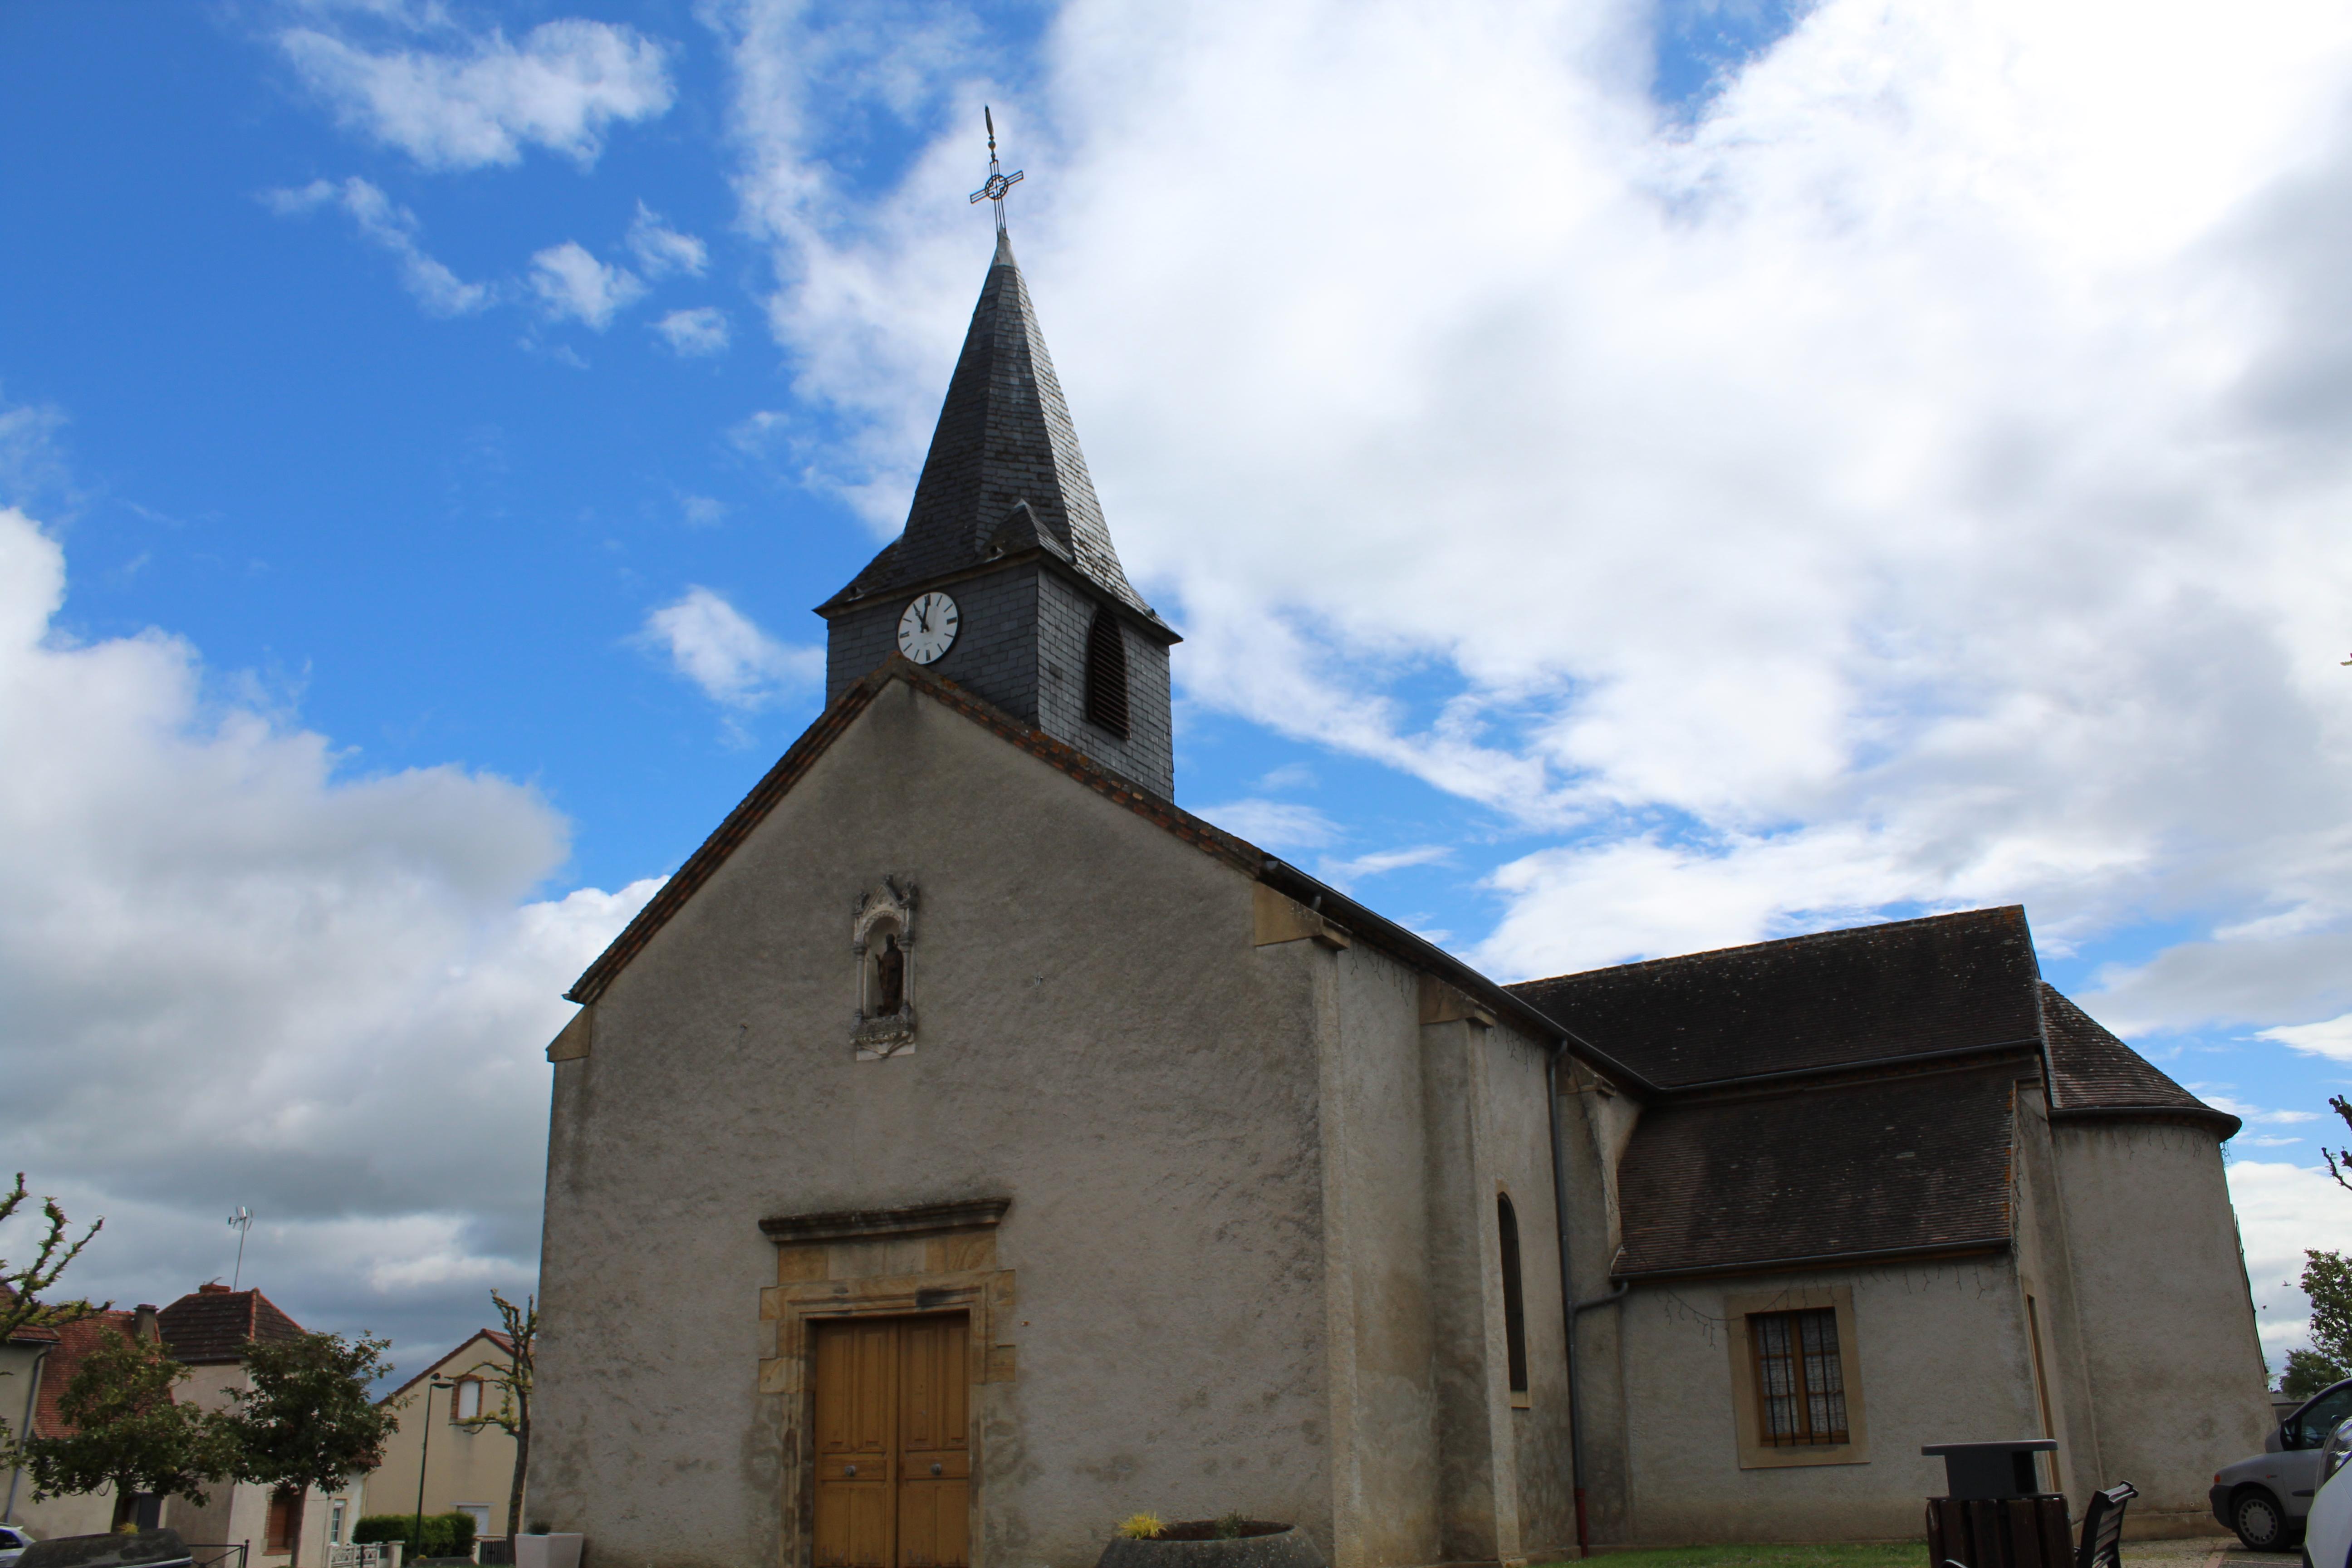 EGLISE SAINT-JEAN-BAPTISTE DE LUSIGNY